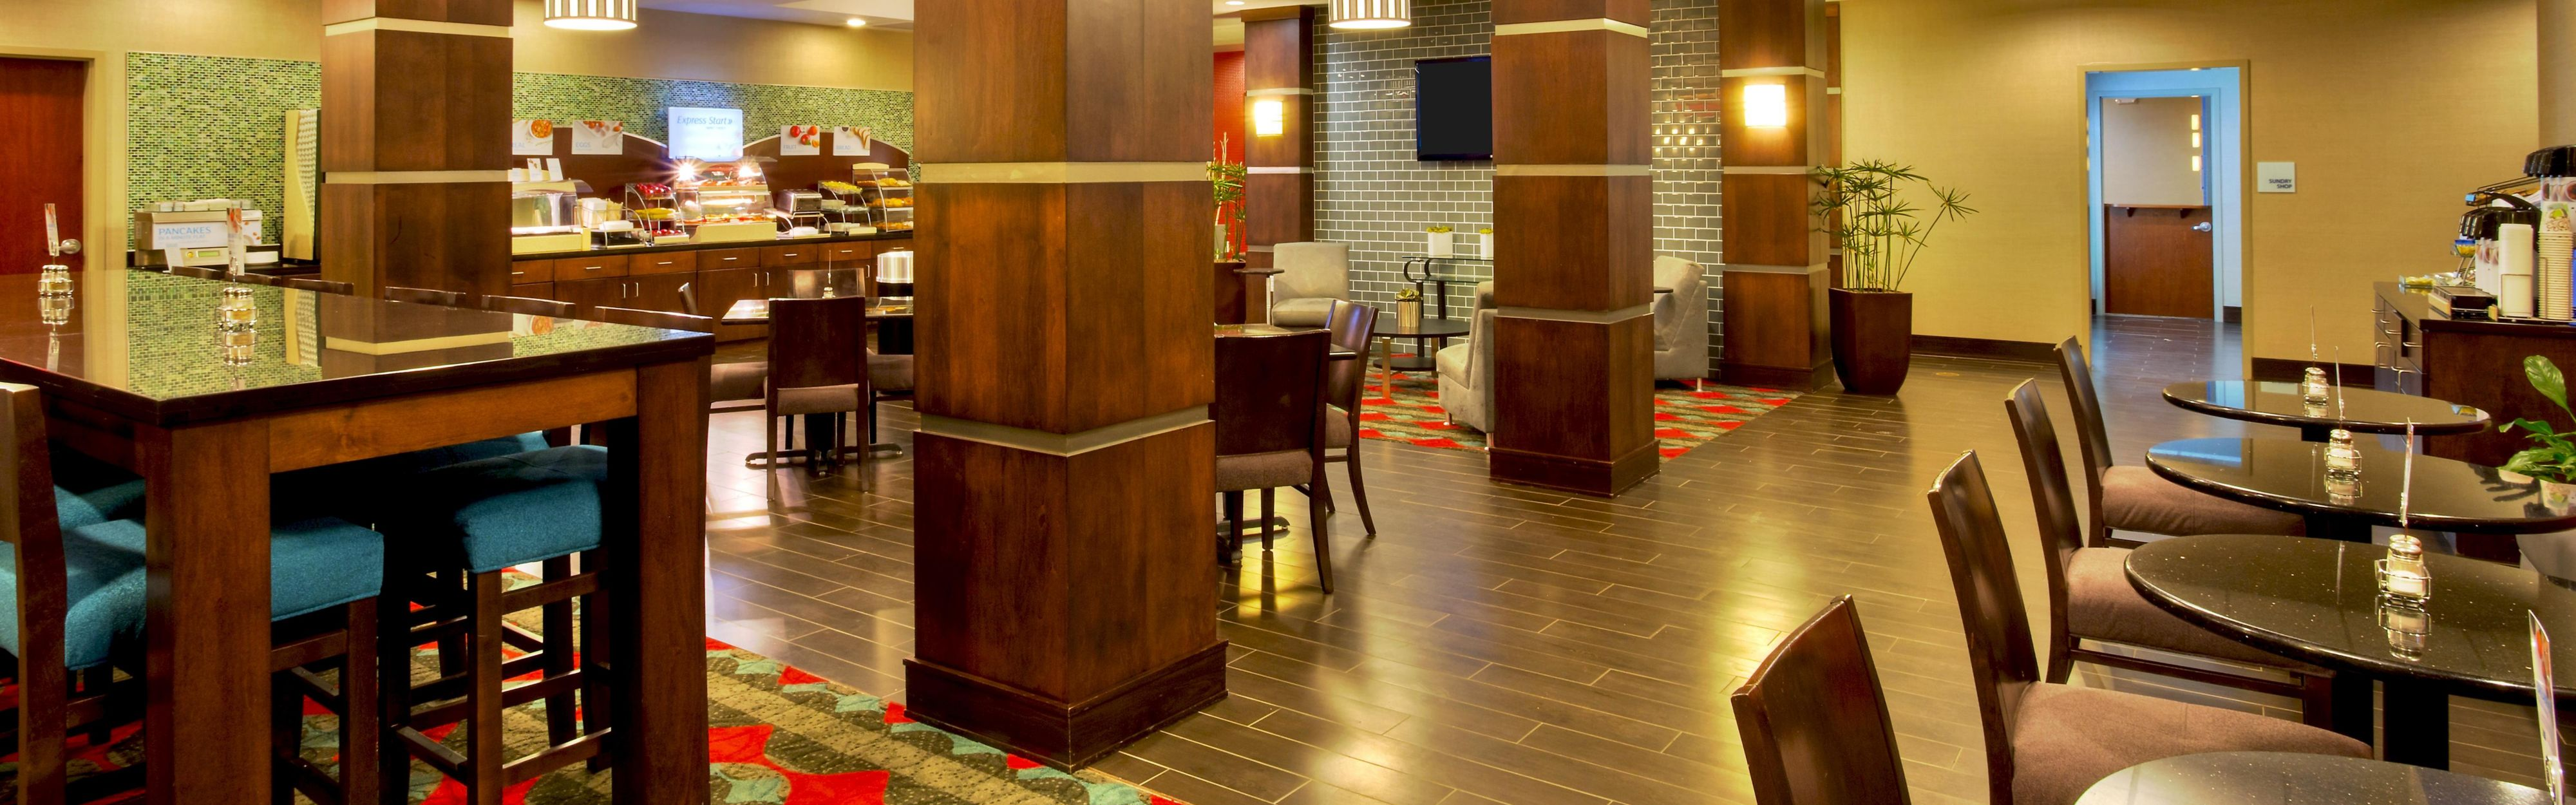 Oak Ridge Hotels Motels